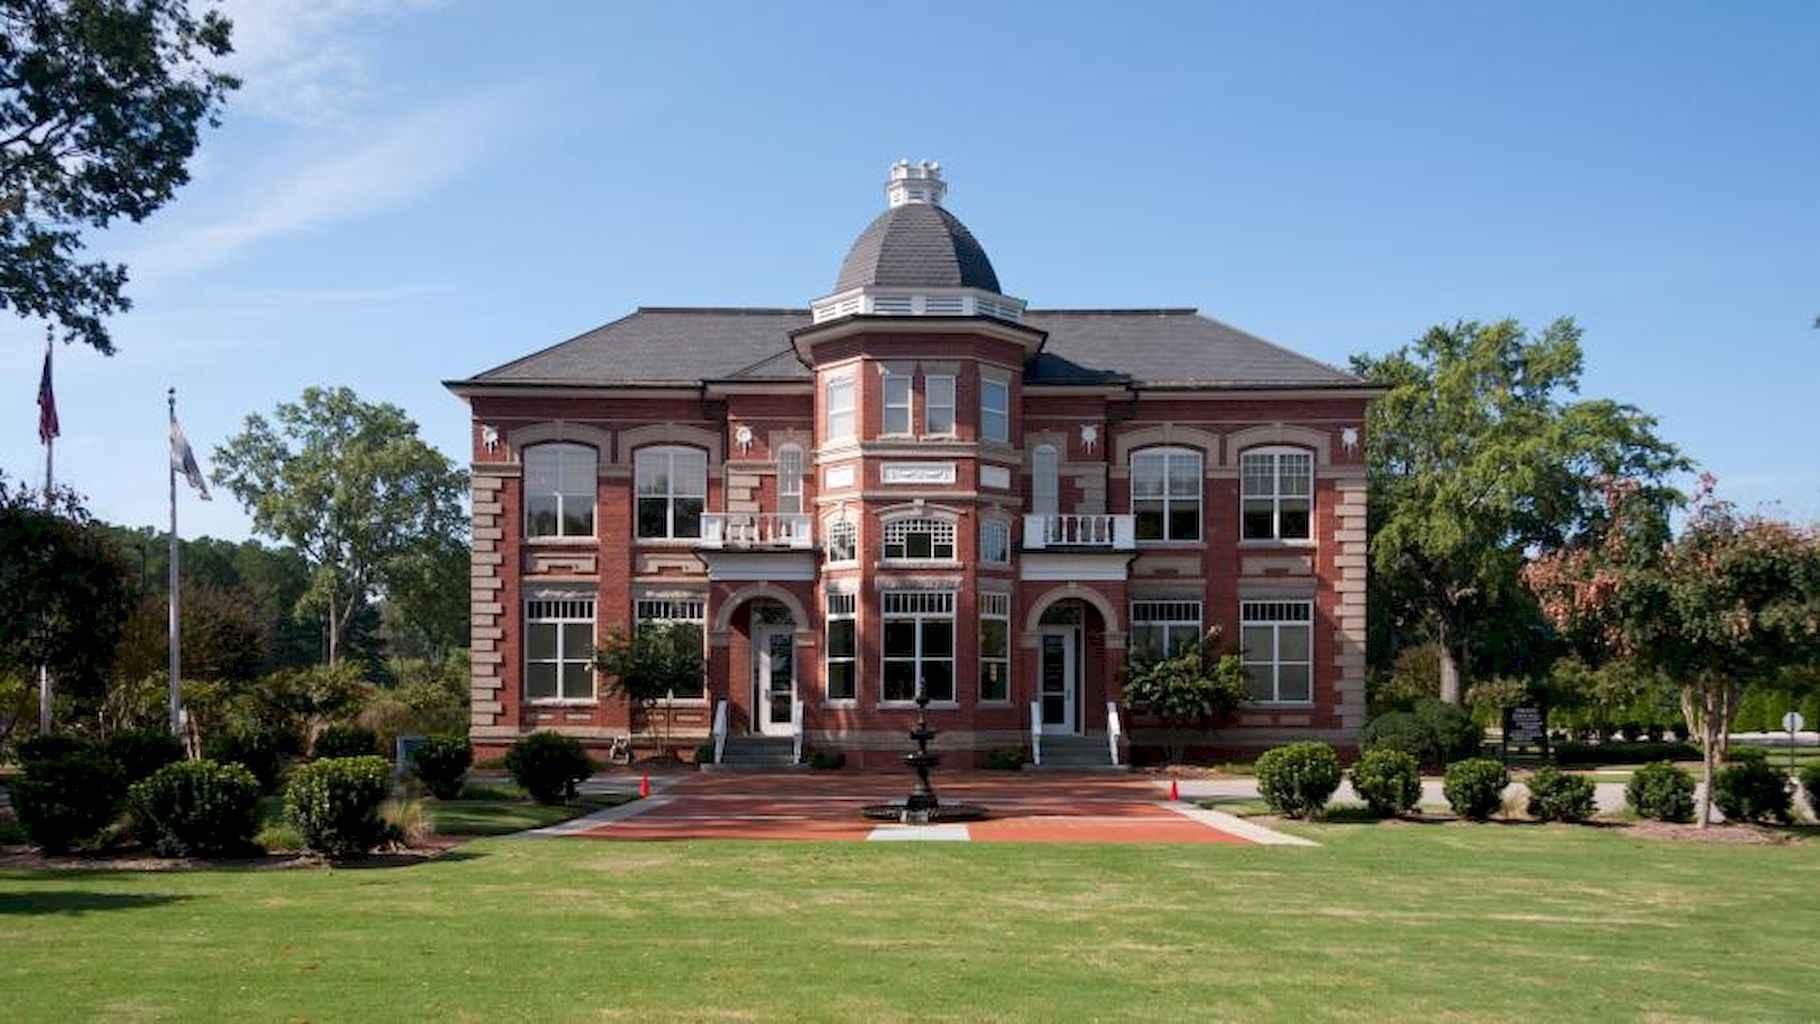 80 Amazing Plantation Homes Farmhouse Design Ideas (77)